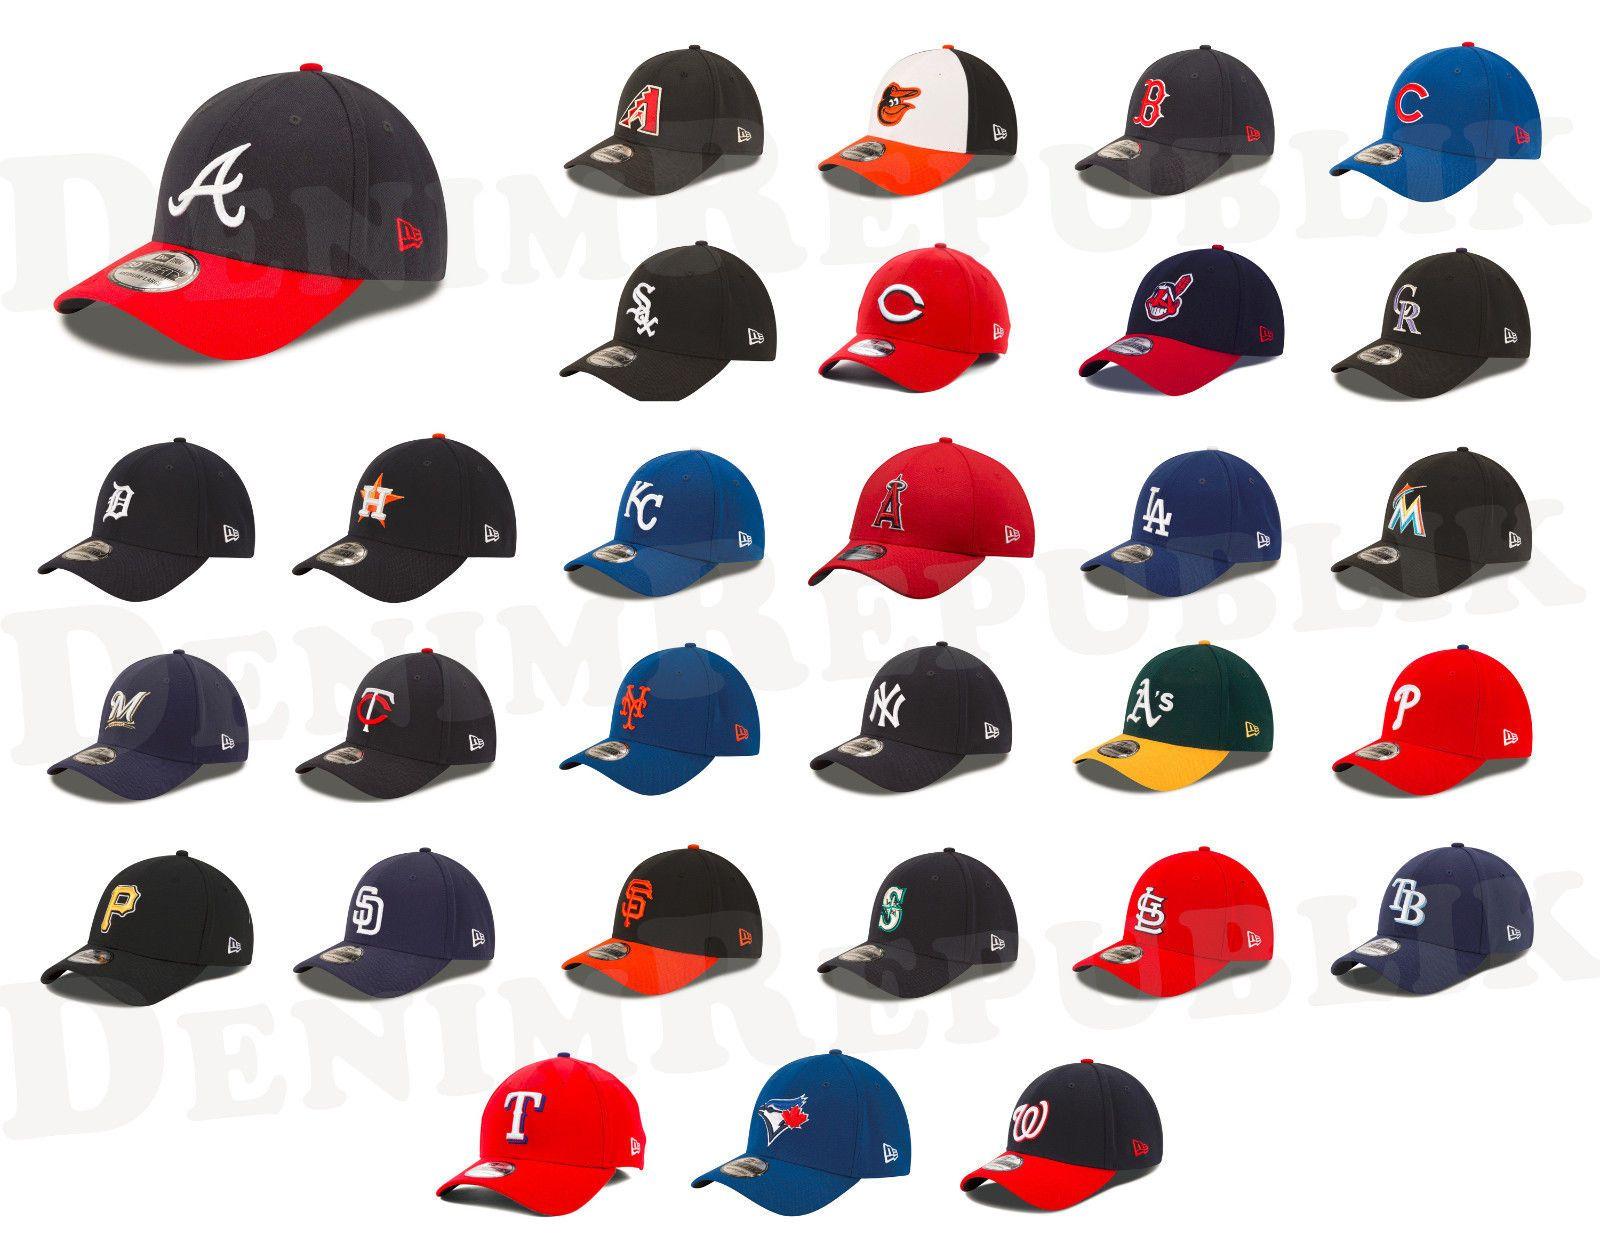 New Era Boston Red Sox Baseball Cap Hat MLB Team Classic 39Thirty 3930 10975835